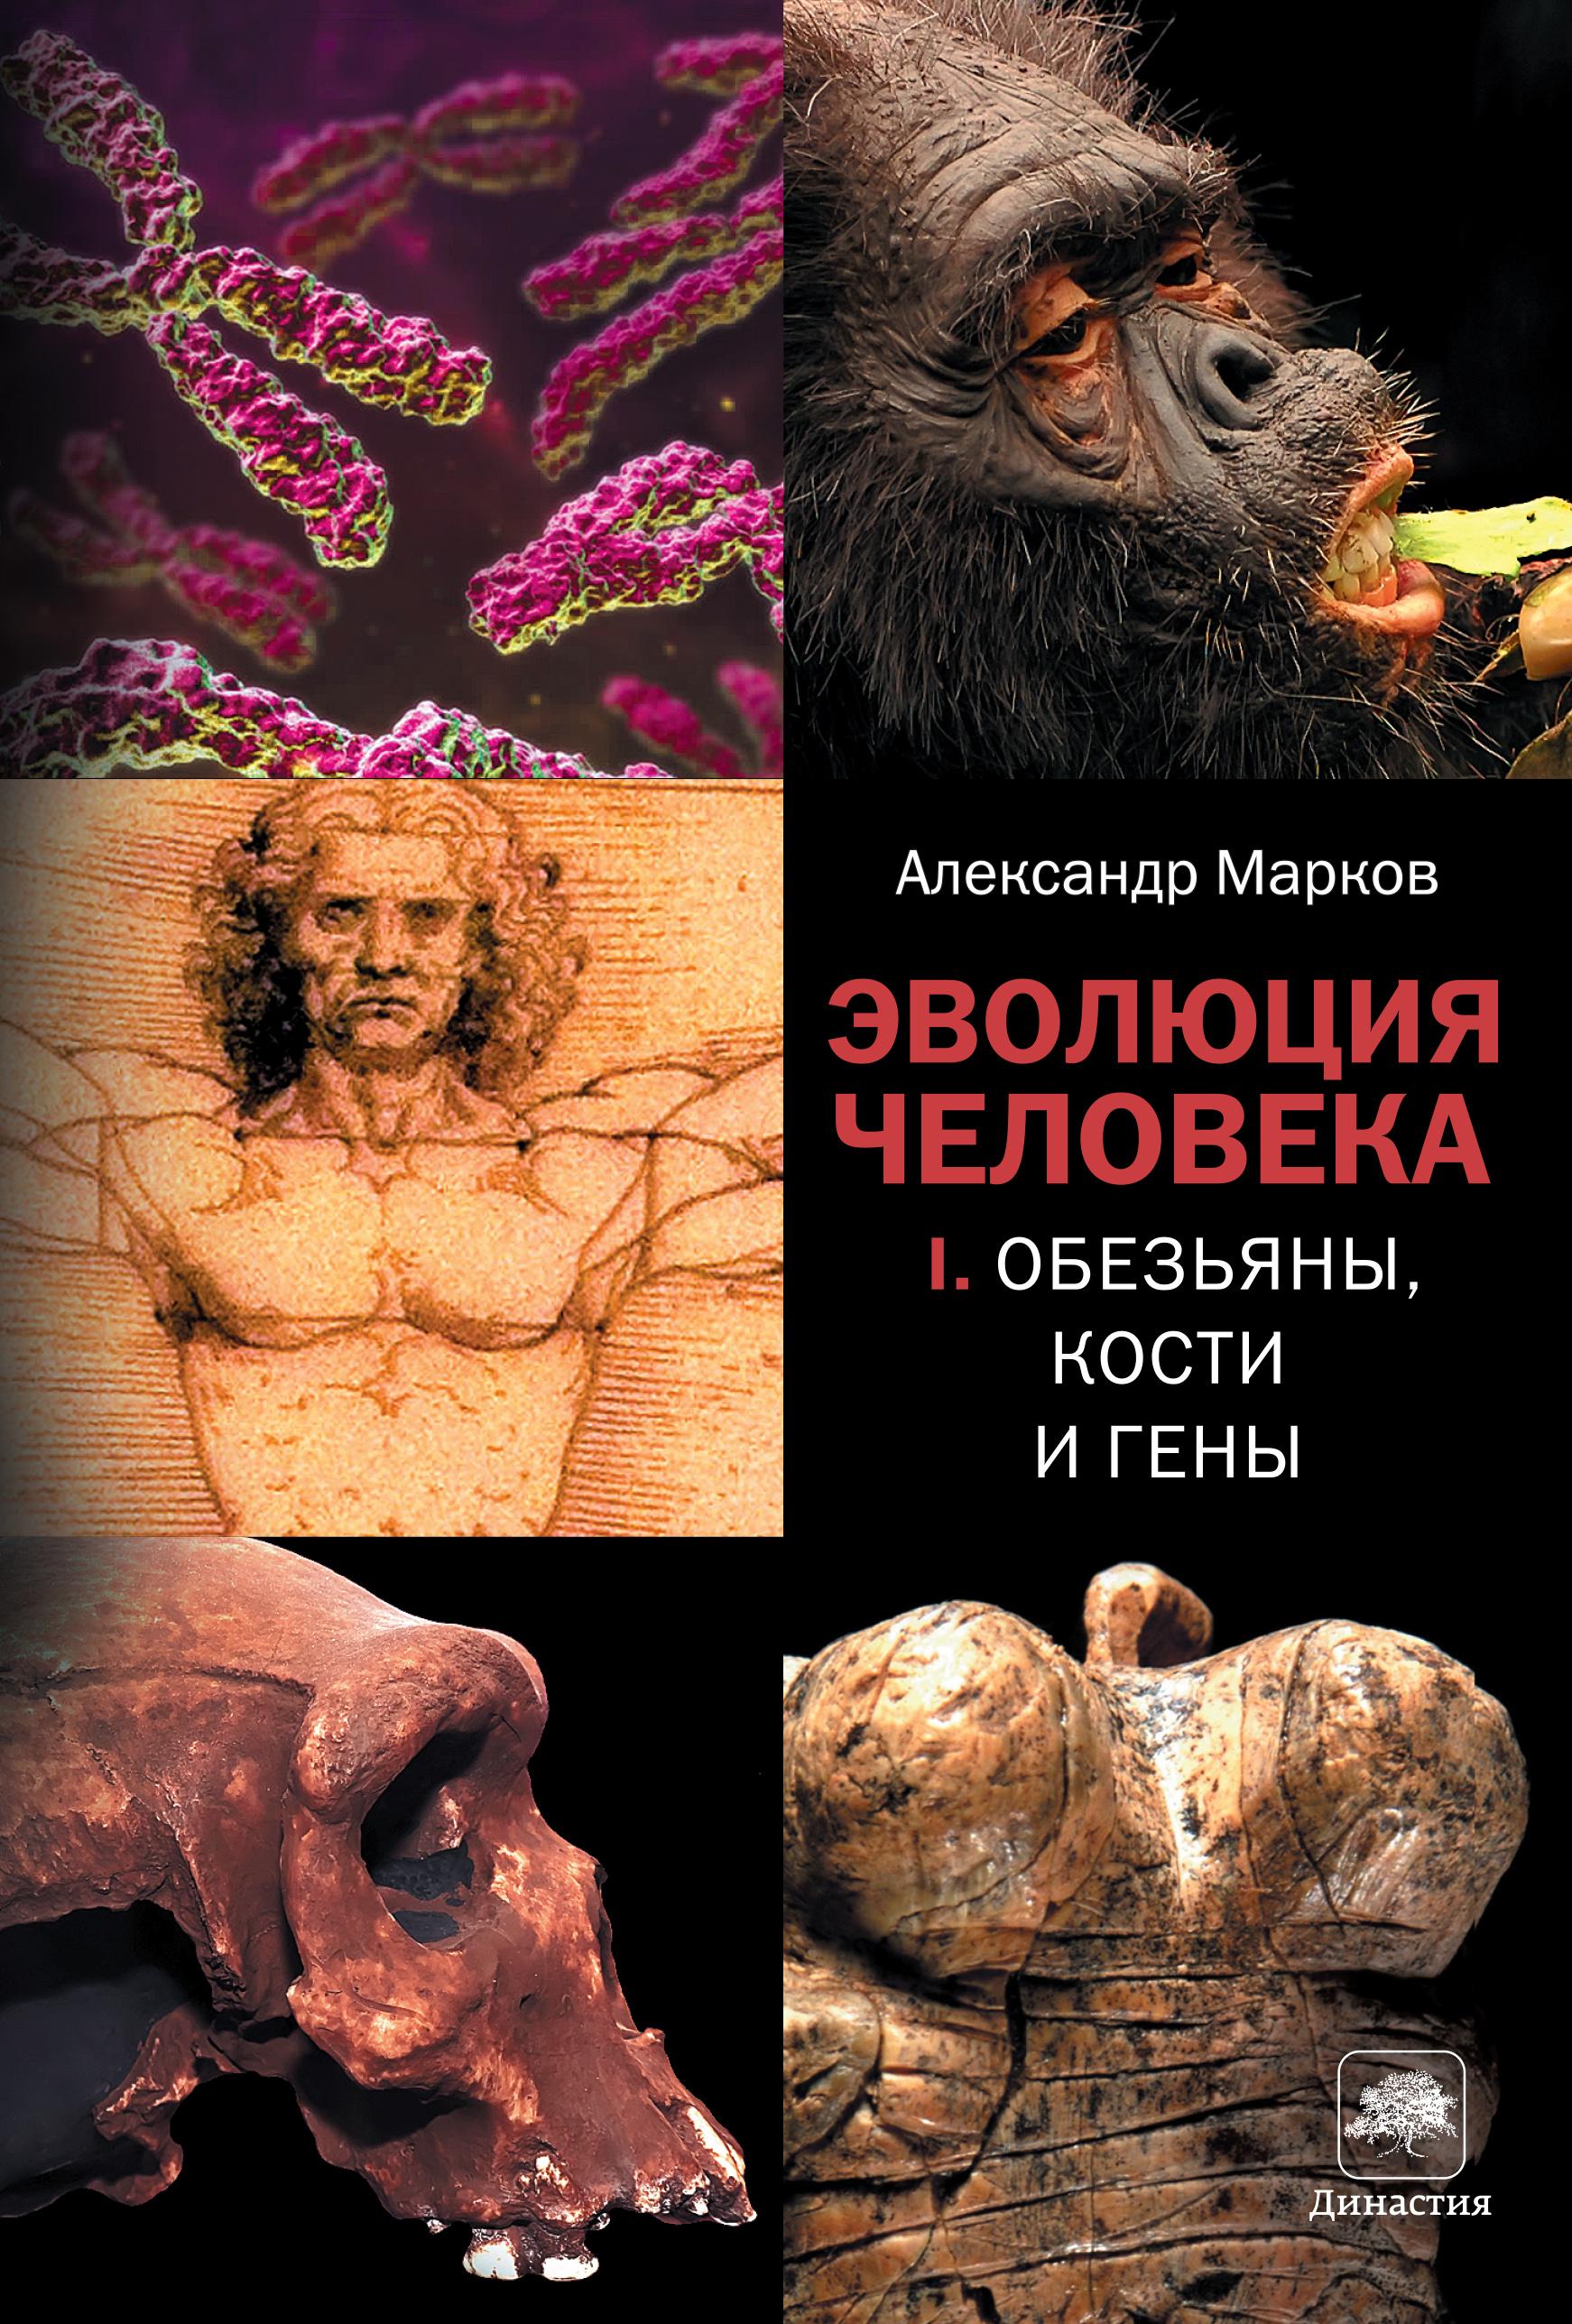 Александр Марков Обезьяны, кости и гены александр марков эволюция человека [в 2 кн ] кн 1 обезьяны кости и гены